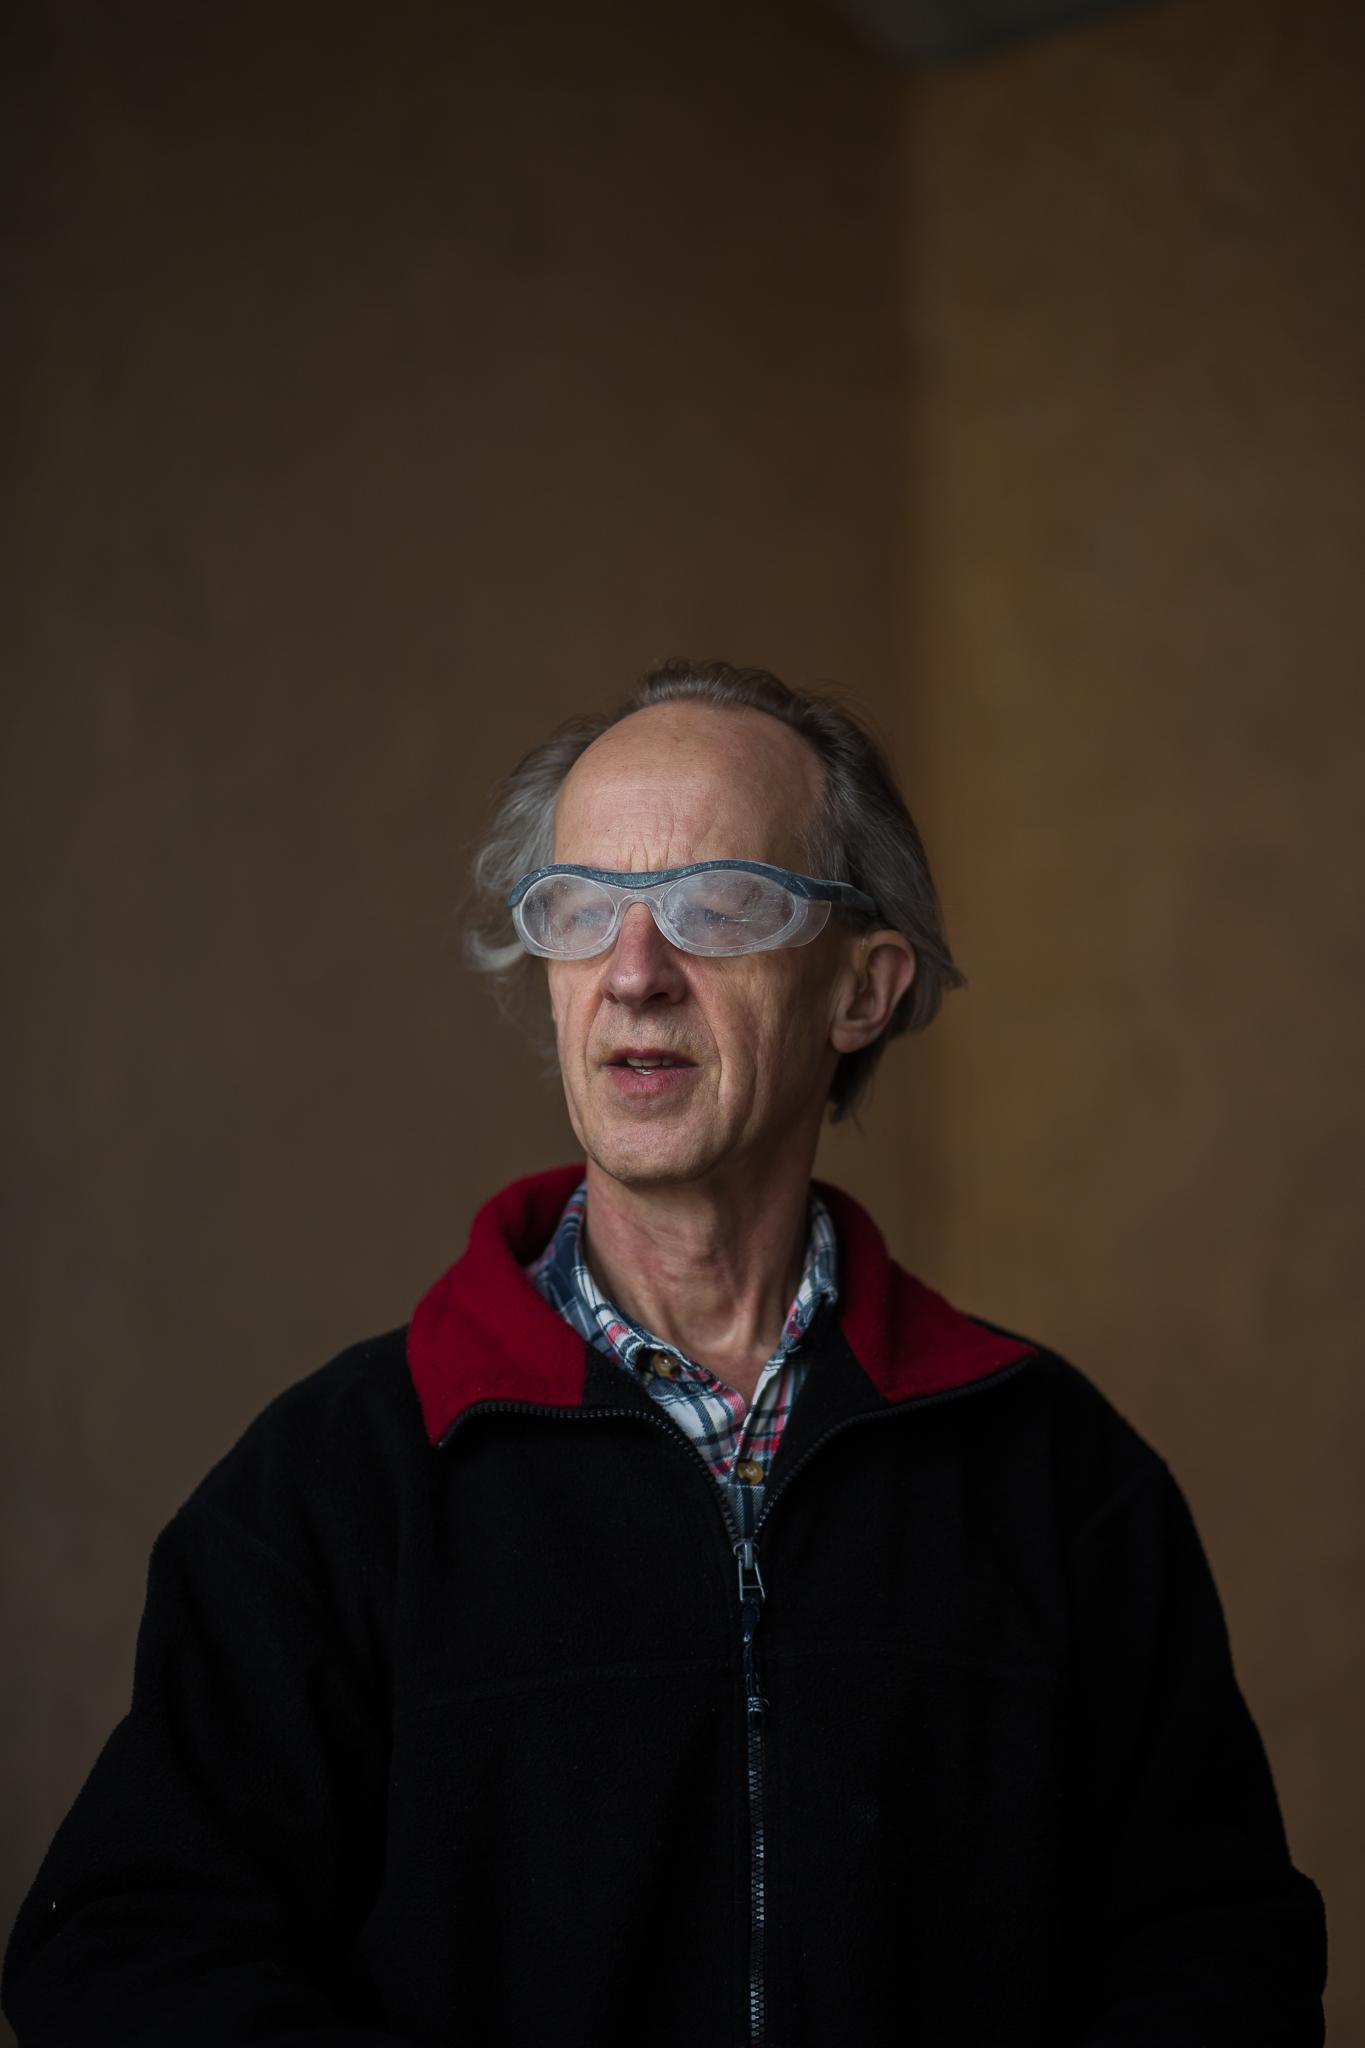 George Kabel, Beeldhouwer - Eindhoven 2018